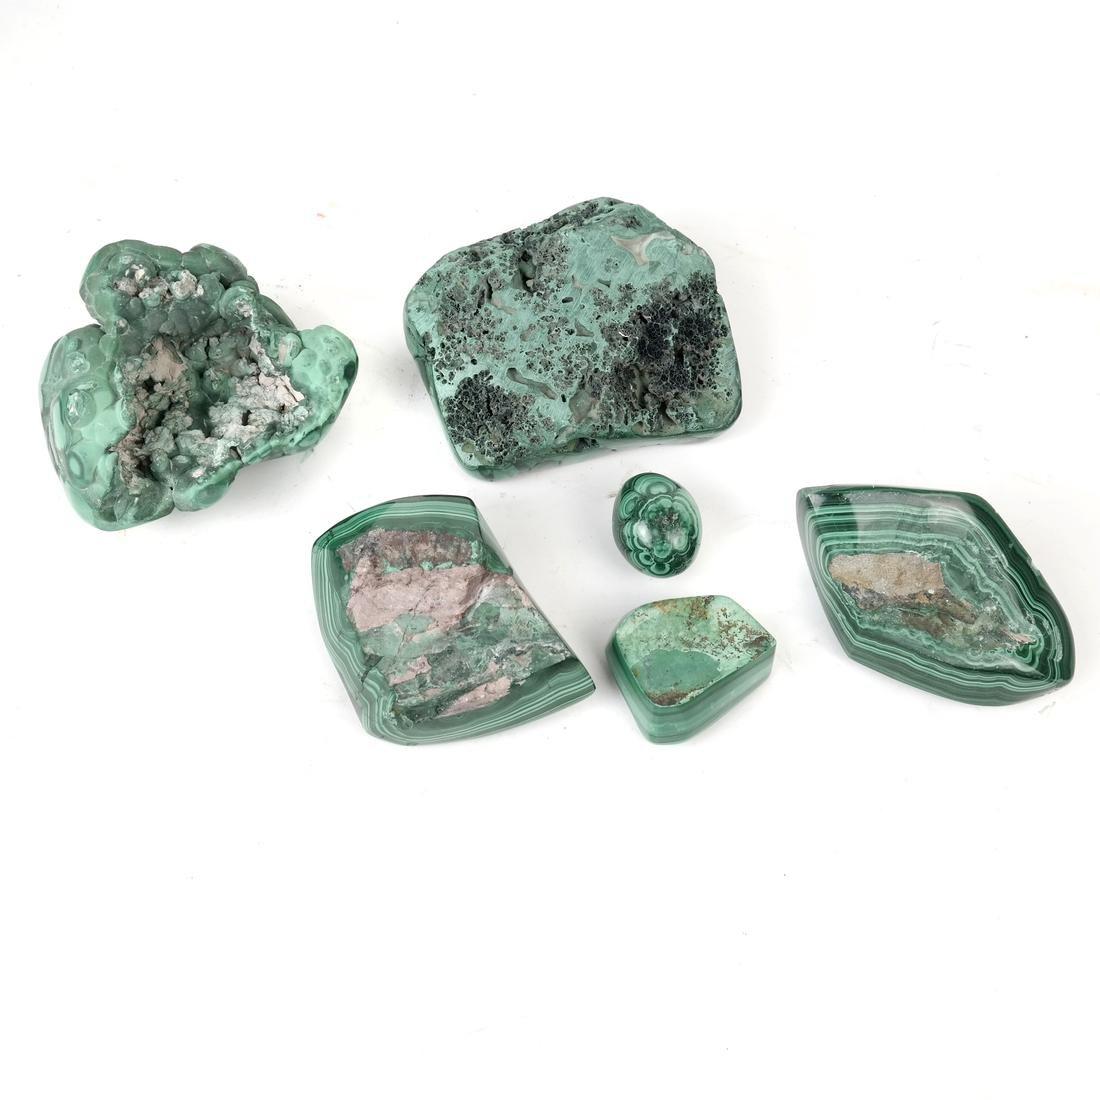 6 Pieces Polished Malachite - 2